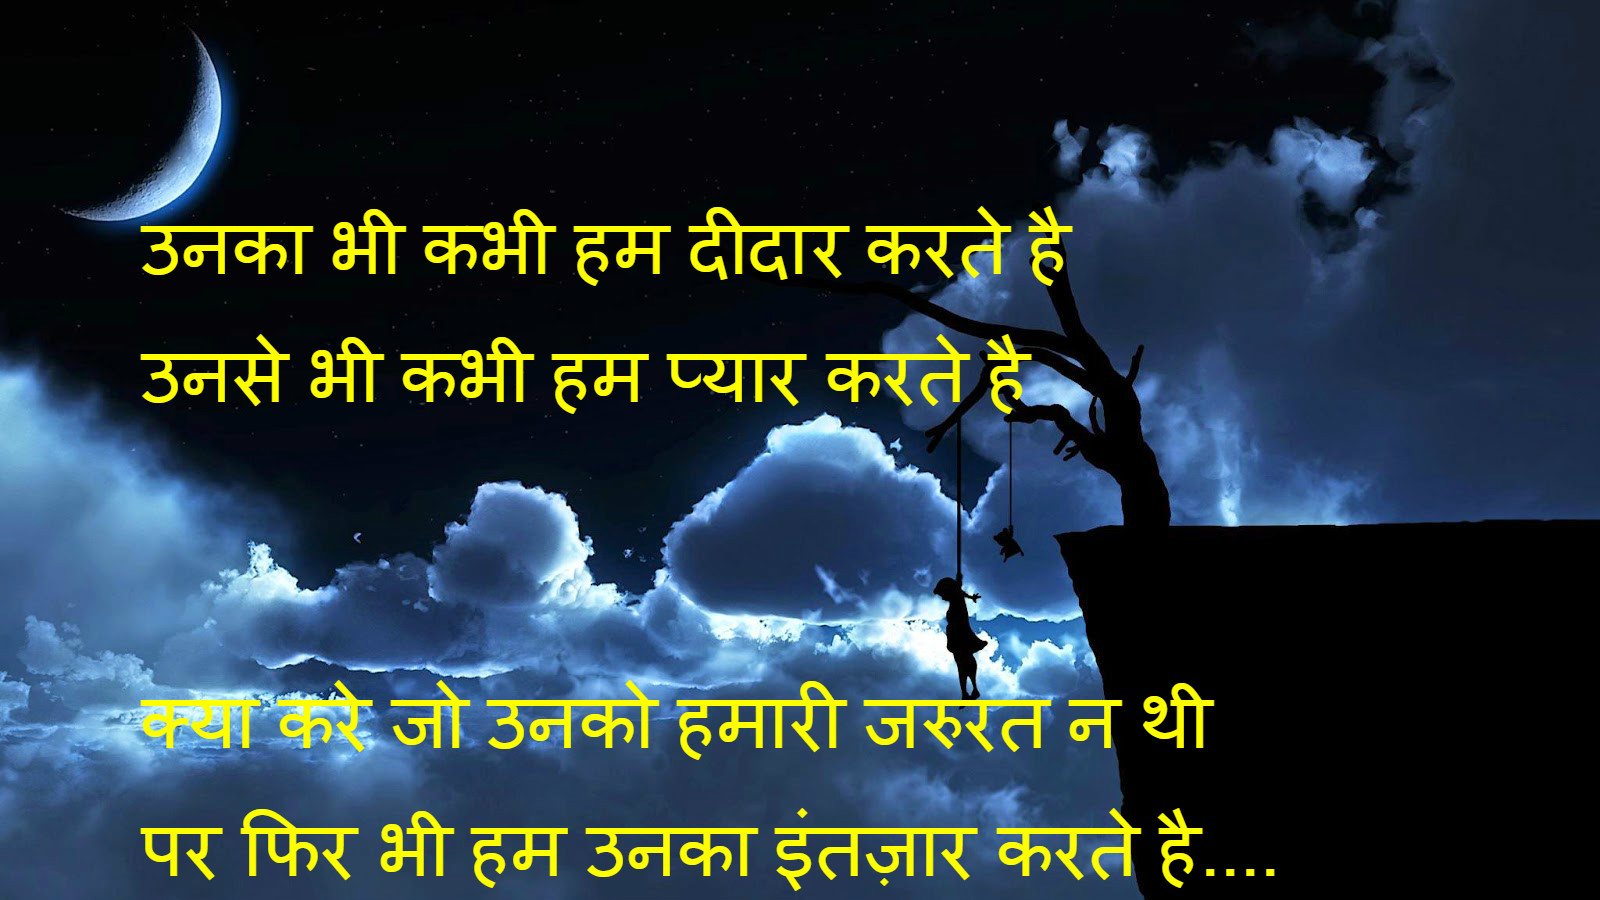 Sad Shayari Hindi Images shayari,whatsapp hindi shayari, love shayari